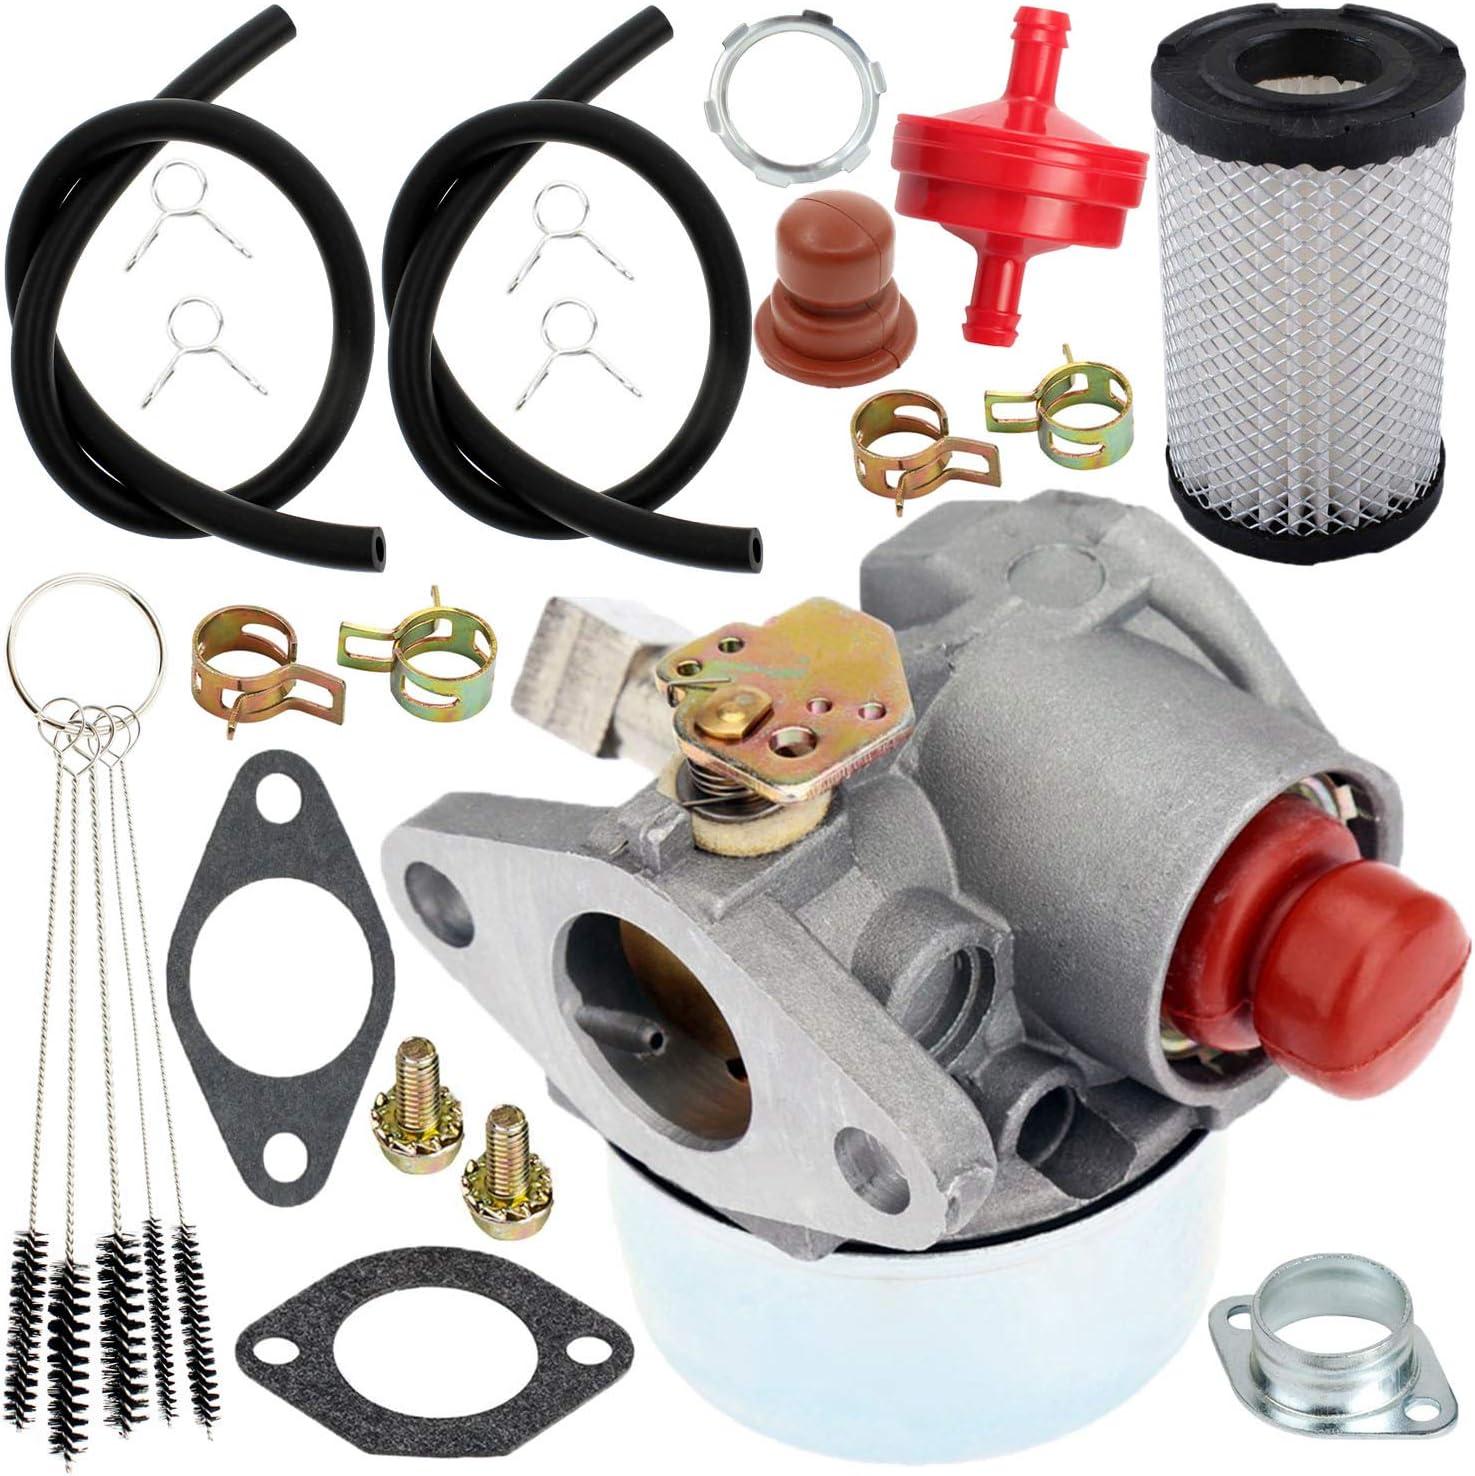 YOFMOO Carburetor Air Filter Compatible for Tecumseh 632795 632795A TVS75 TVS90 TVS100 TVS105 TVS115 TVS120 ECV100 TVXL90 TVXL105 TVXL115 LAV30 LAV35 LAV40 LAV50 TNT120 4.5HP 5HP Craftsman Lawnmower